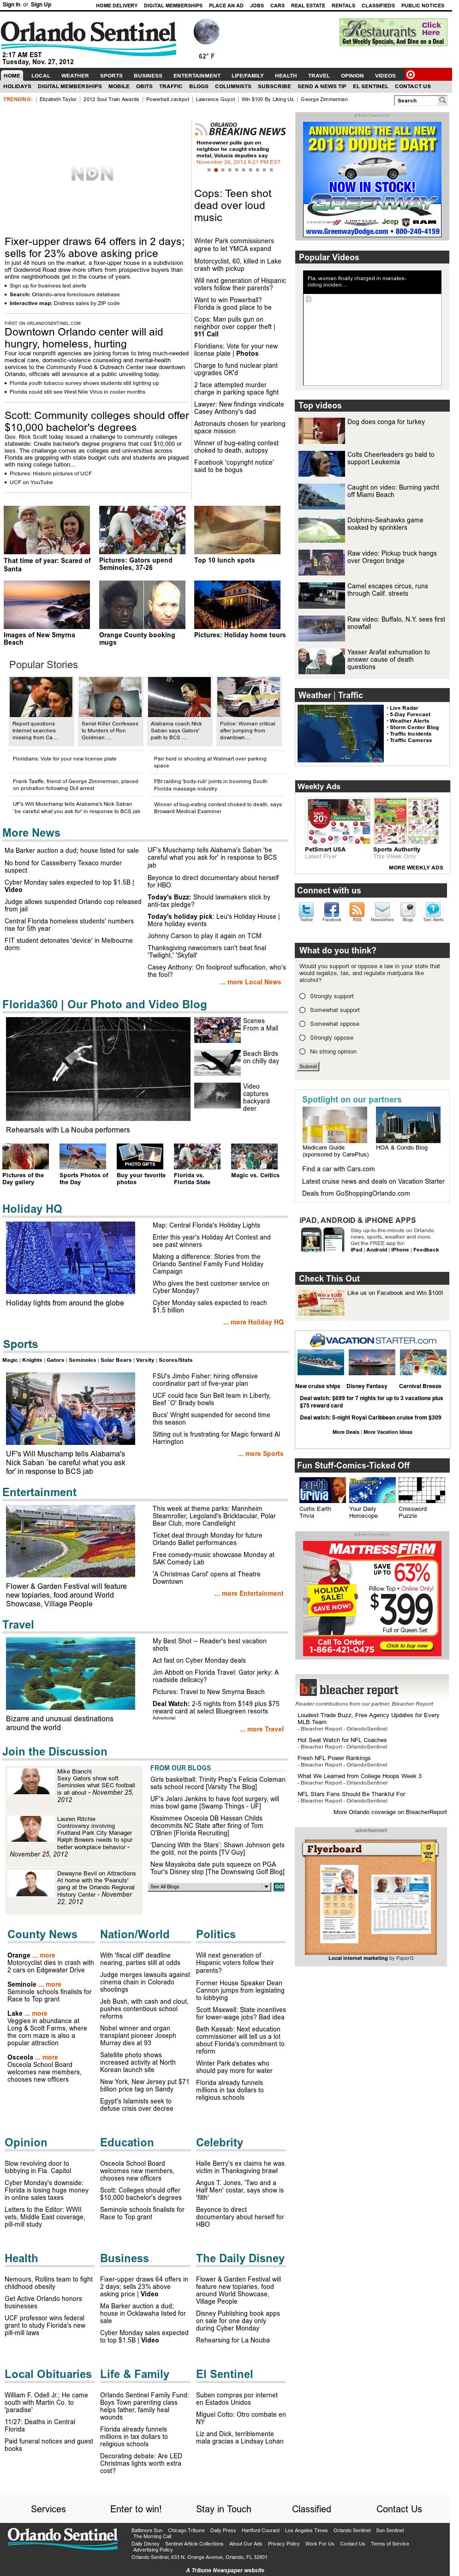 Orlando Sentinel at Tuesday Nov. 27, 2012, 7:24 a.m. UTC